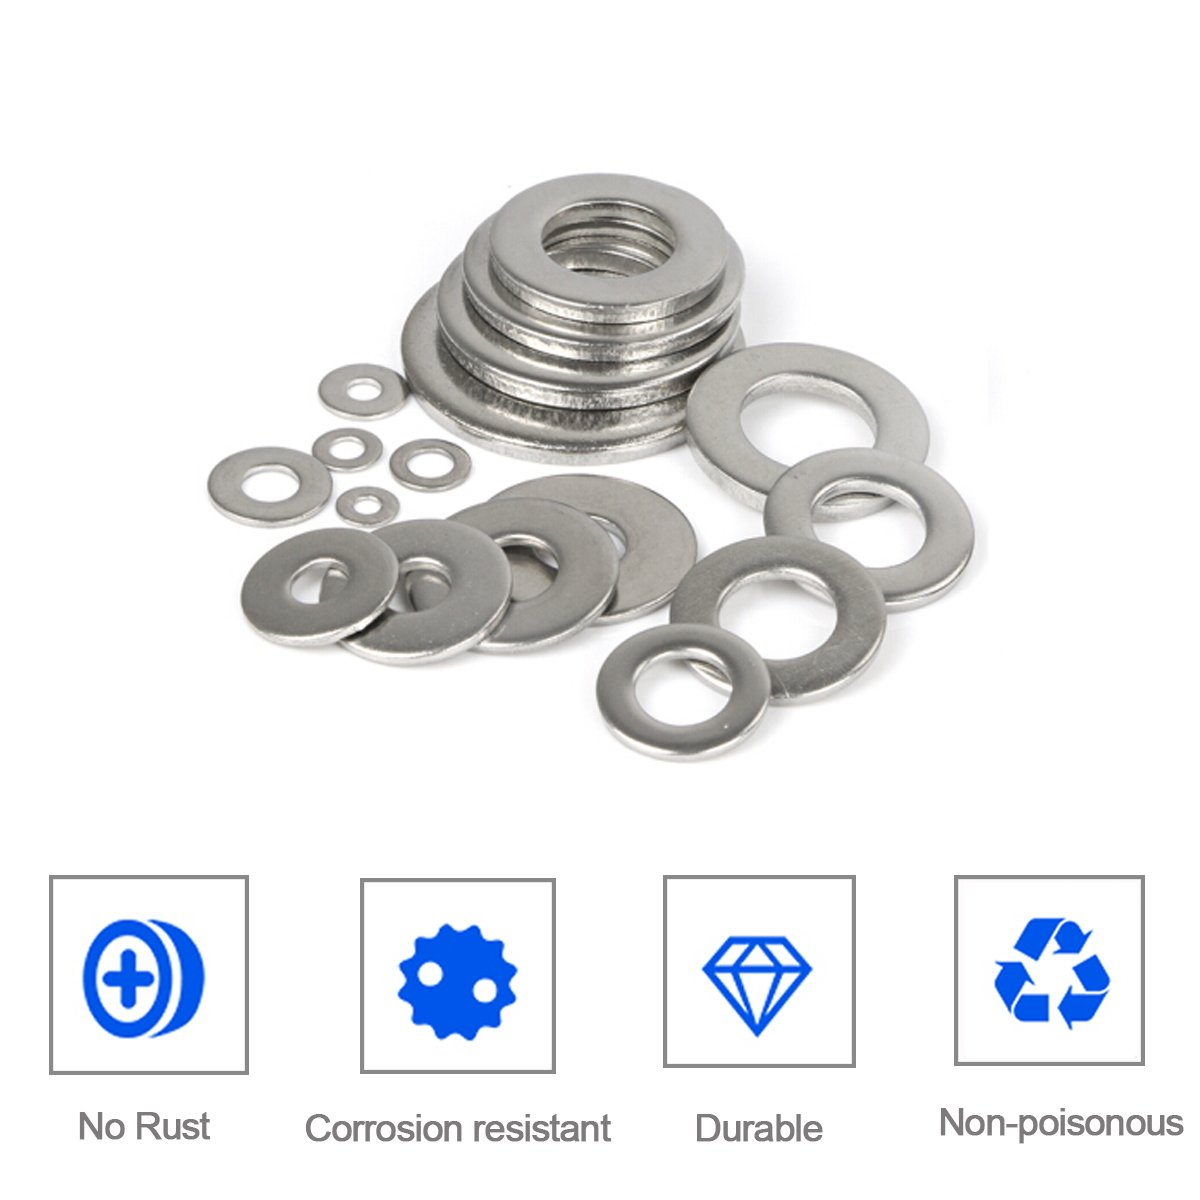 Flat Washer M8161.6 Flat washers Screw M3//M4//M5//M6//M8//M10 Washer Assortment Set Corrosion Resistant Metric 304 Steel